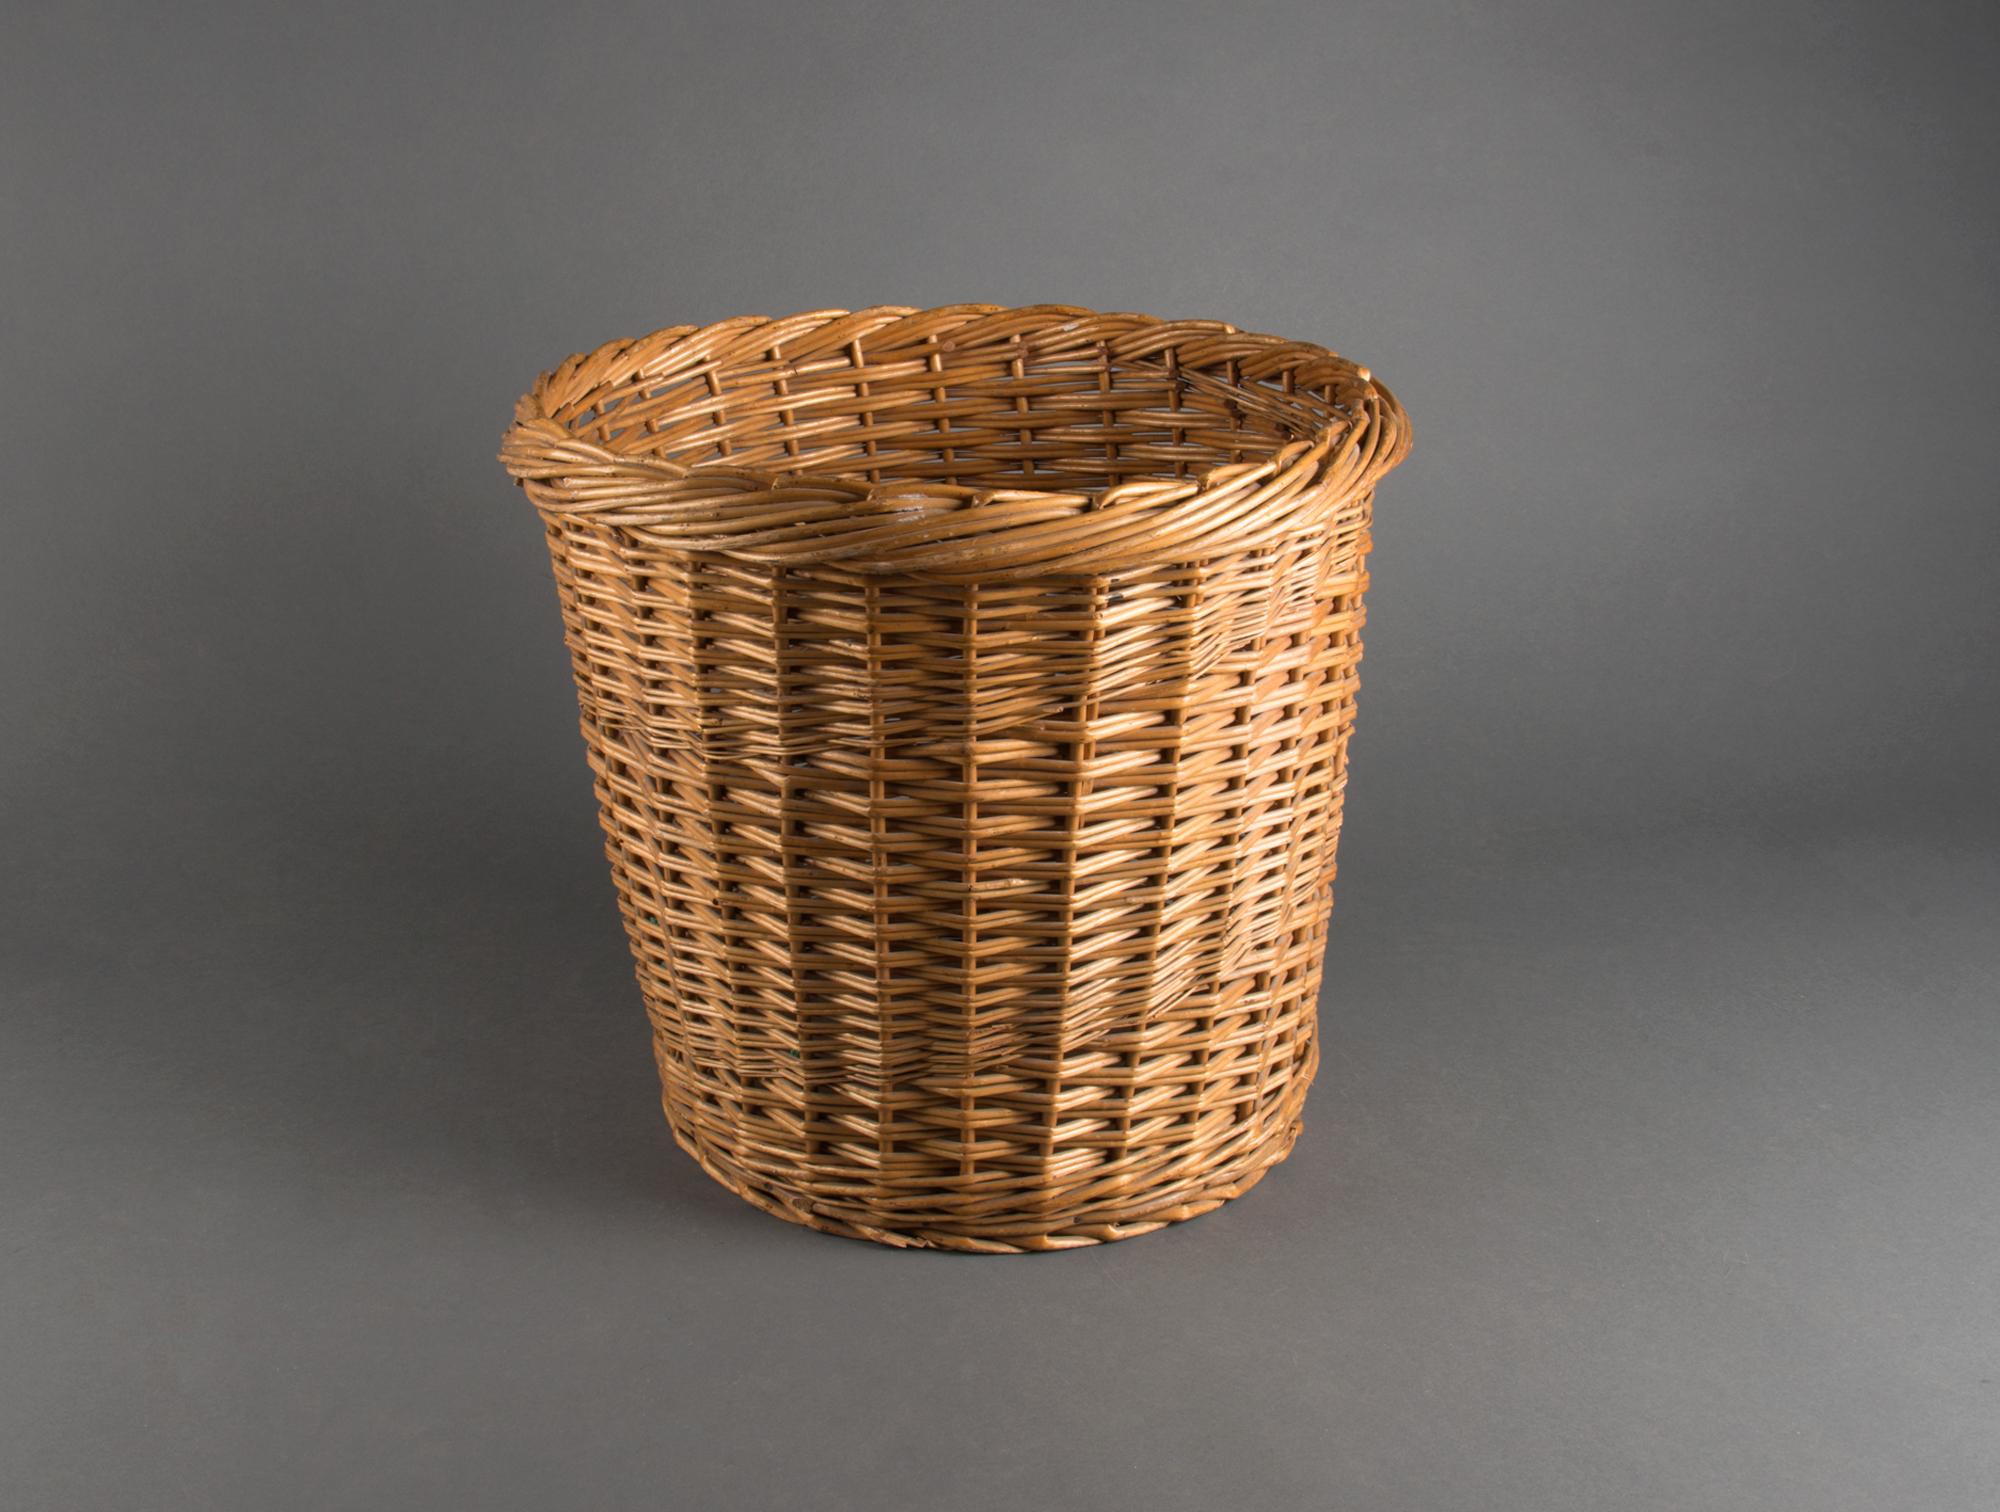 Wicker Wastepaper Basket